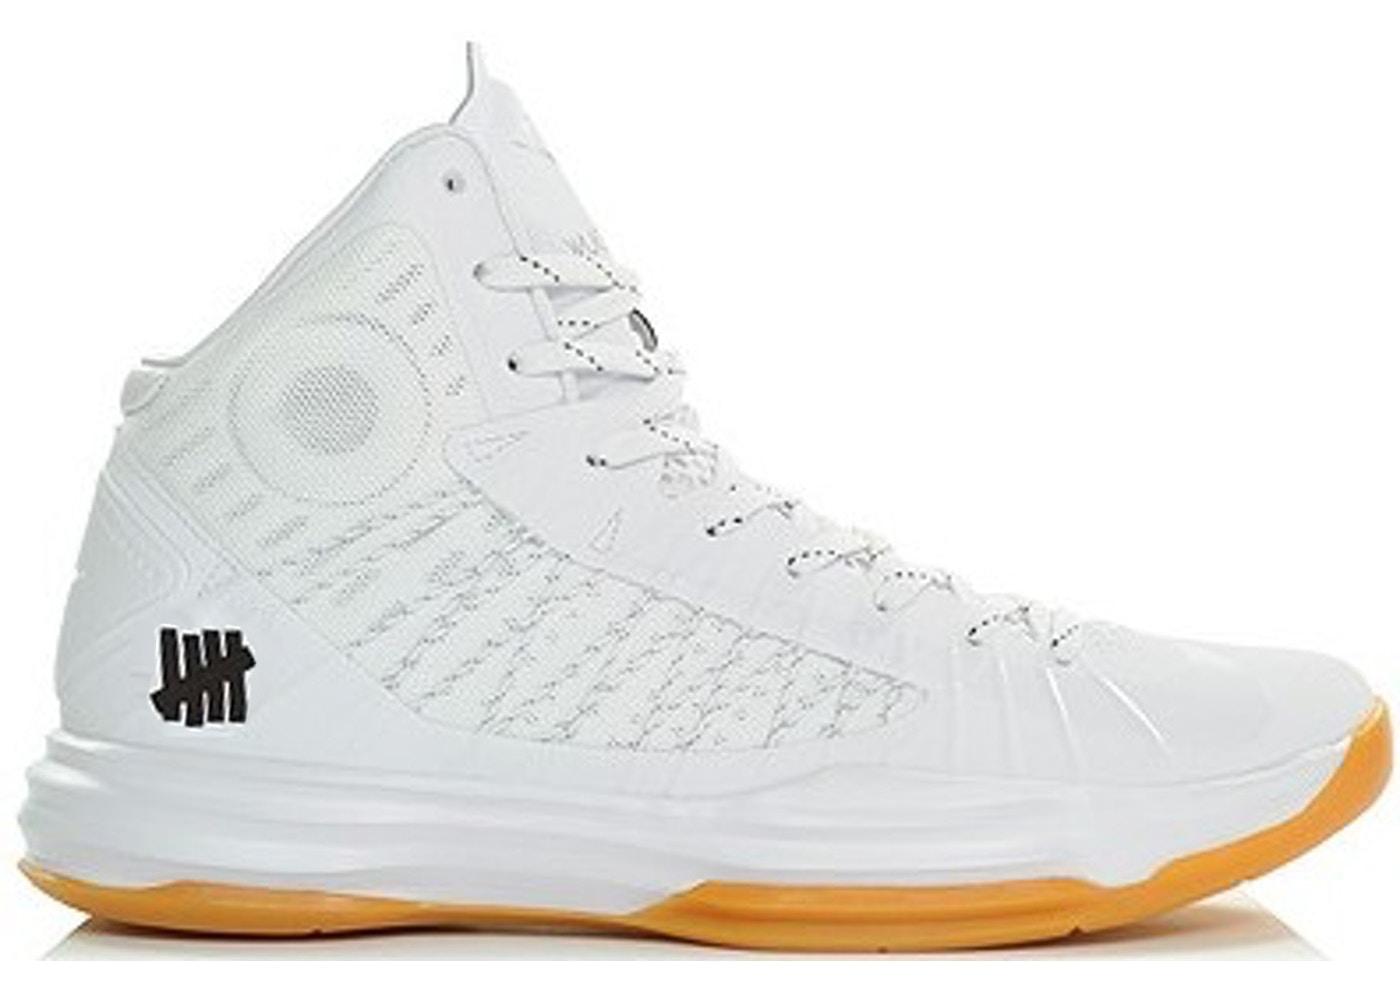 4fa8346852a0 Buy Nike Basketball Hyperdunk Shoes   Deadstock Sneakers